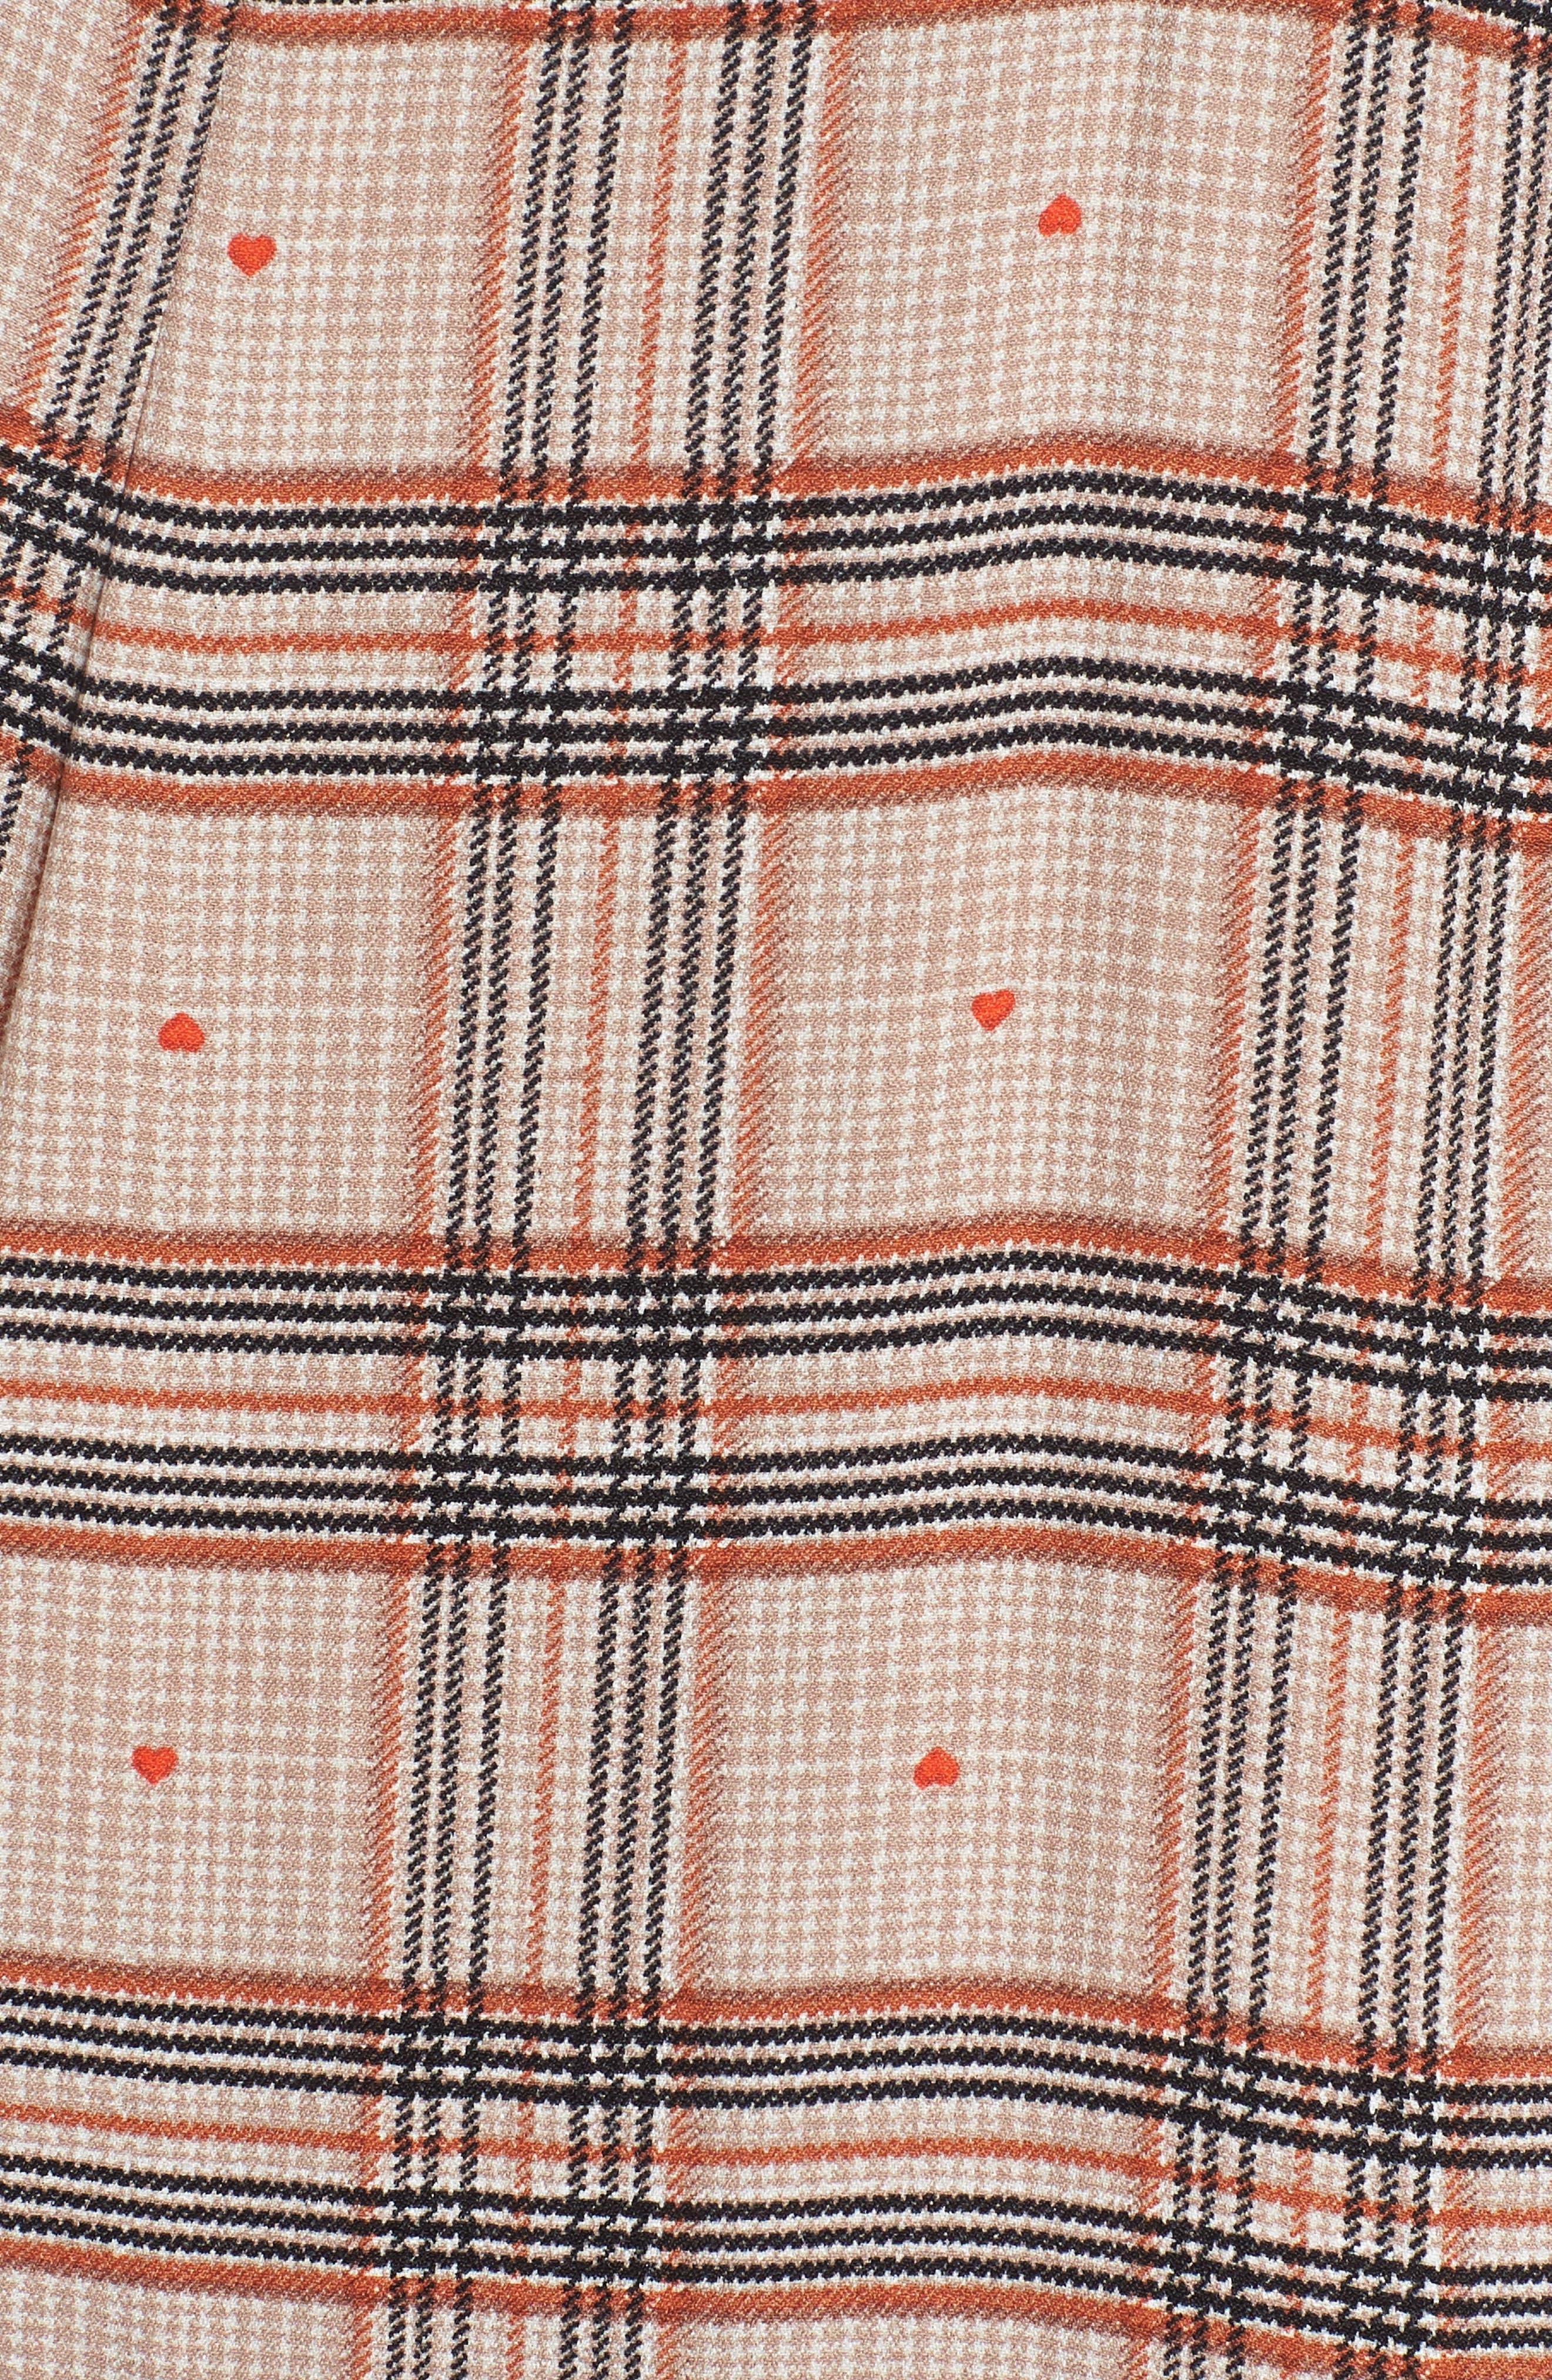 Quinn Wrap Midi Dress,                             Alternate thumbnail 6, color,                             PLAID WITH HEART